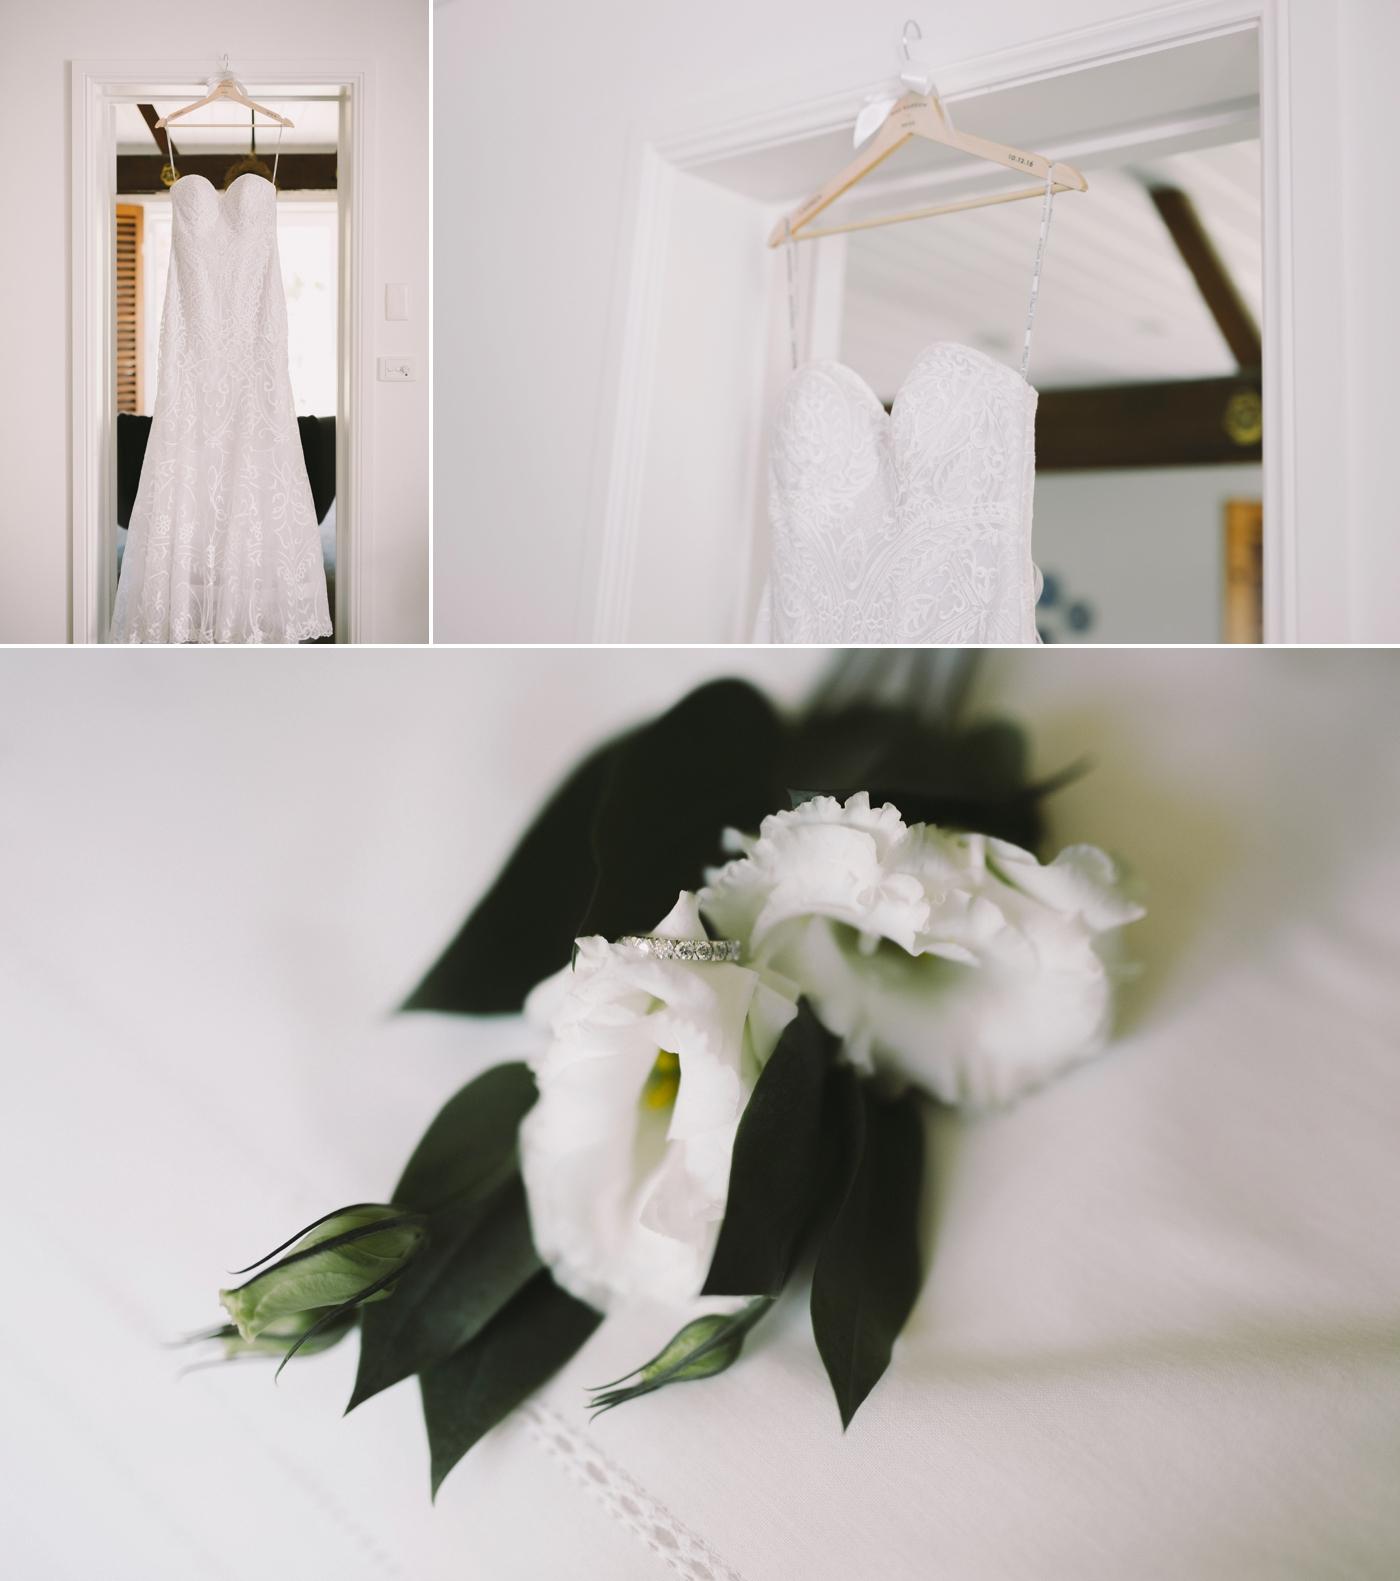 Lauren & Max - Marybank Estate Wedding - Natural wedding photographer in Adelaide - www.katherineschultzphotography.com 6